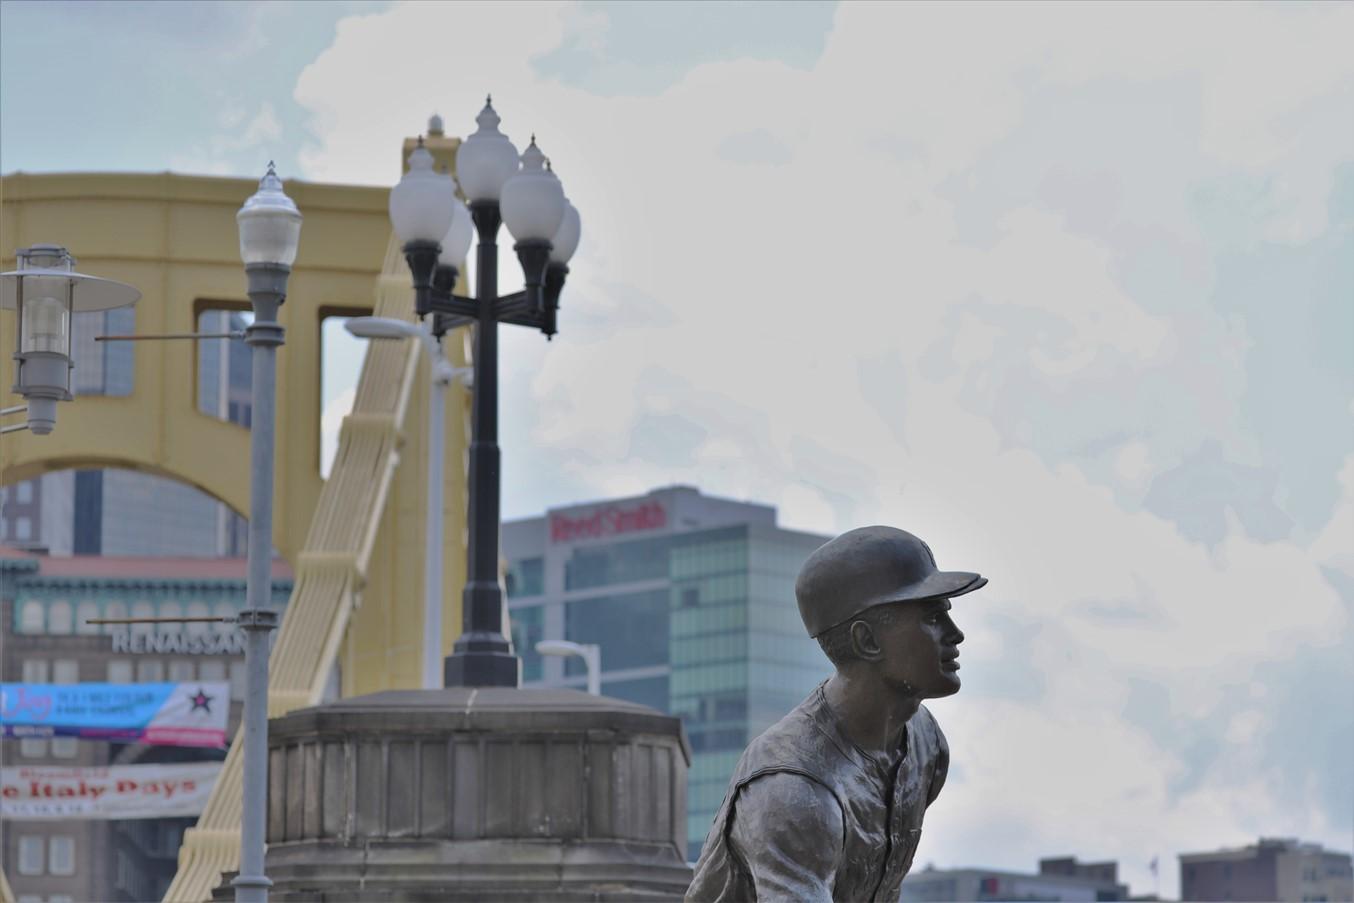 2018 08 04 136 Pittsburgh.jpg